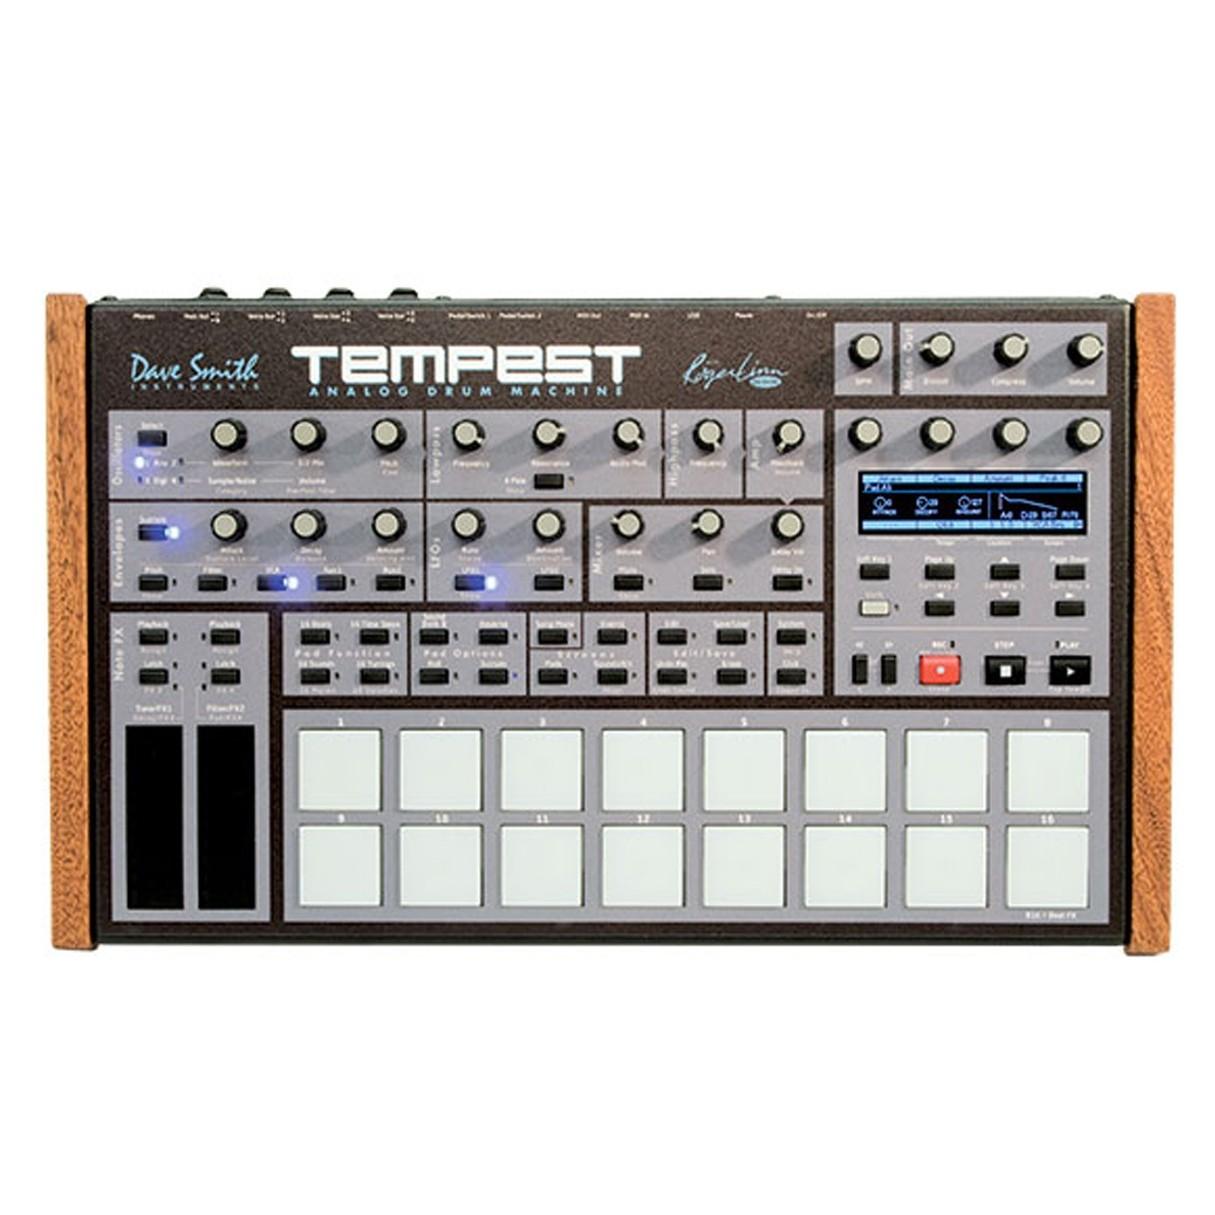 dave smith instrument tempest analog drum machine. Black Bedroom Furniture Sets. Home Design Ideas